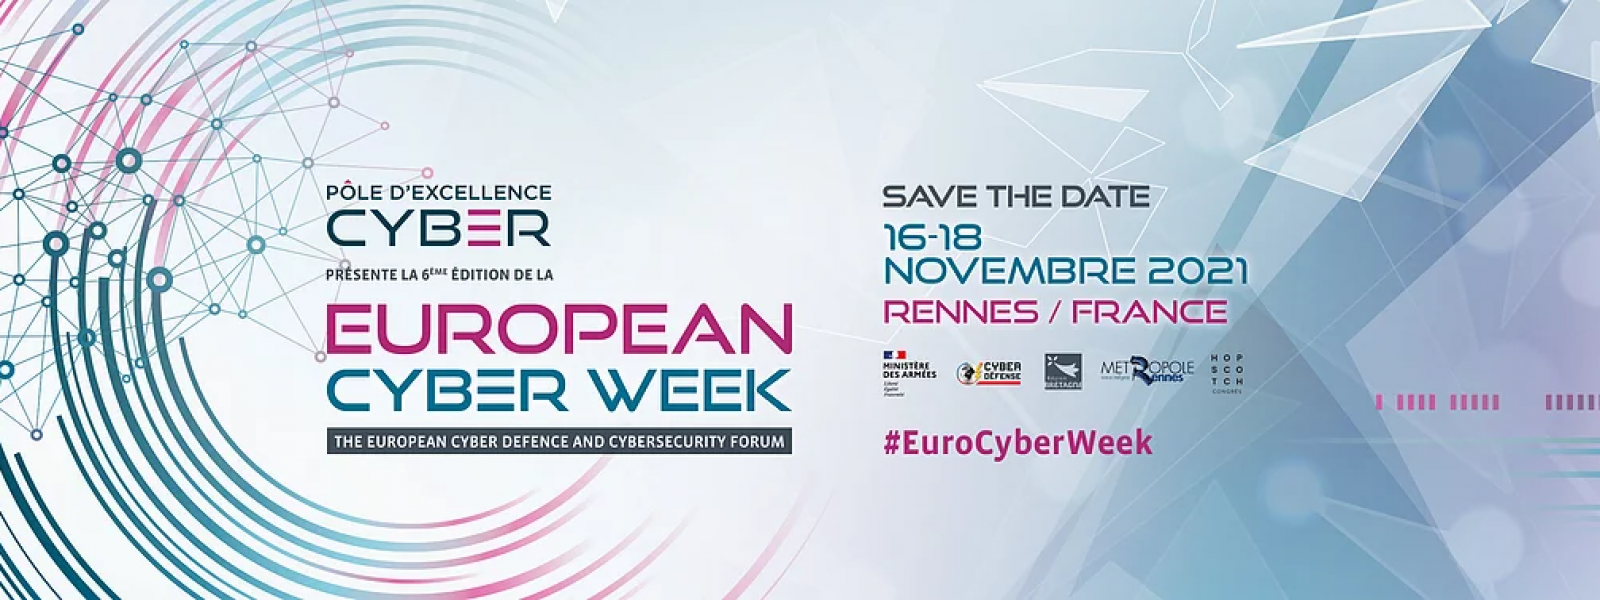 Bannière European Cyber Week 2021